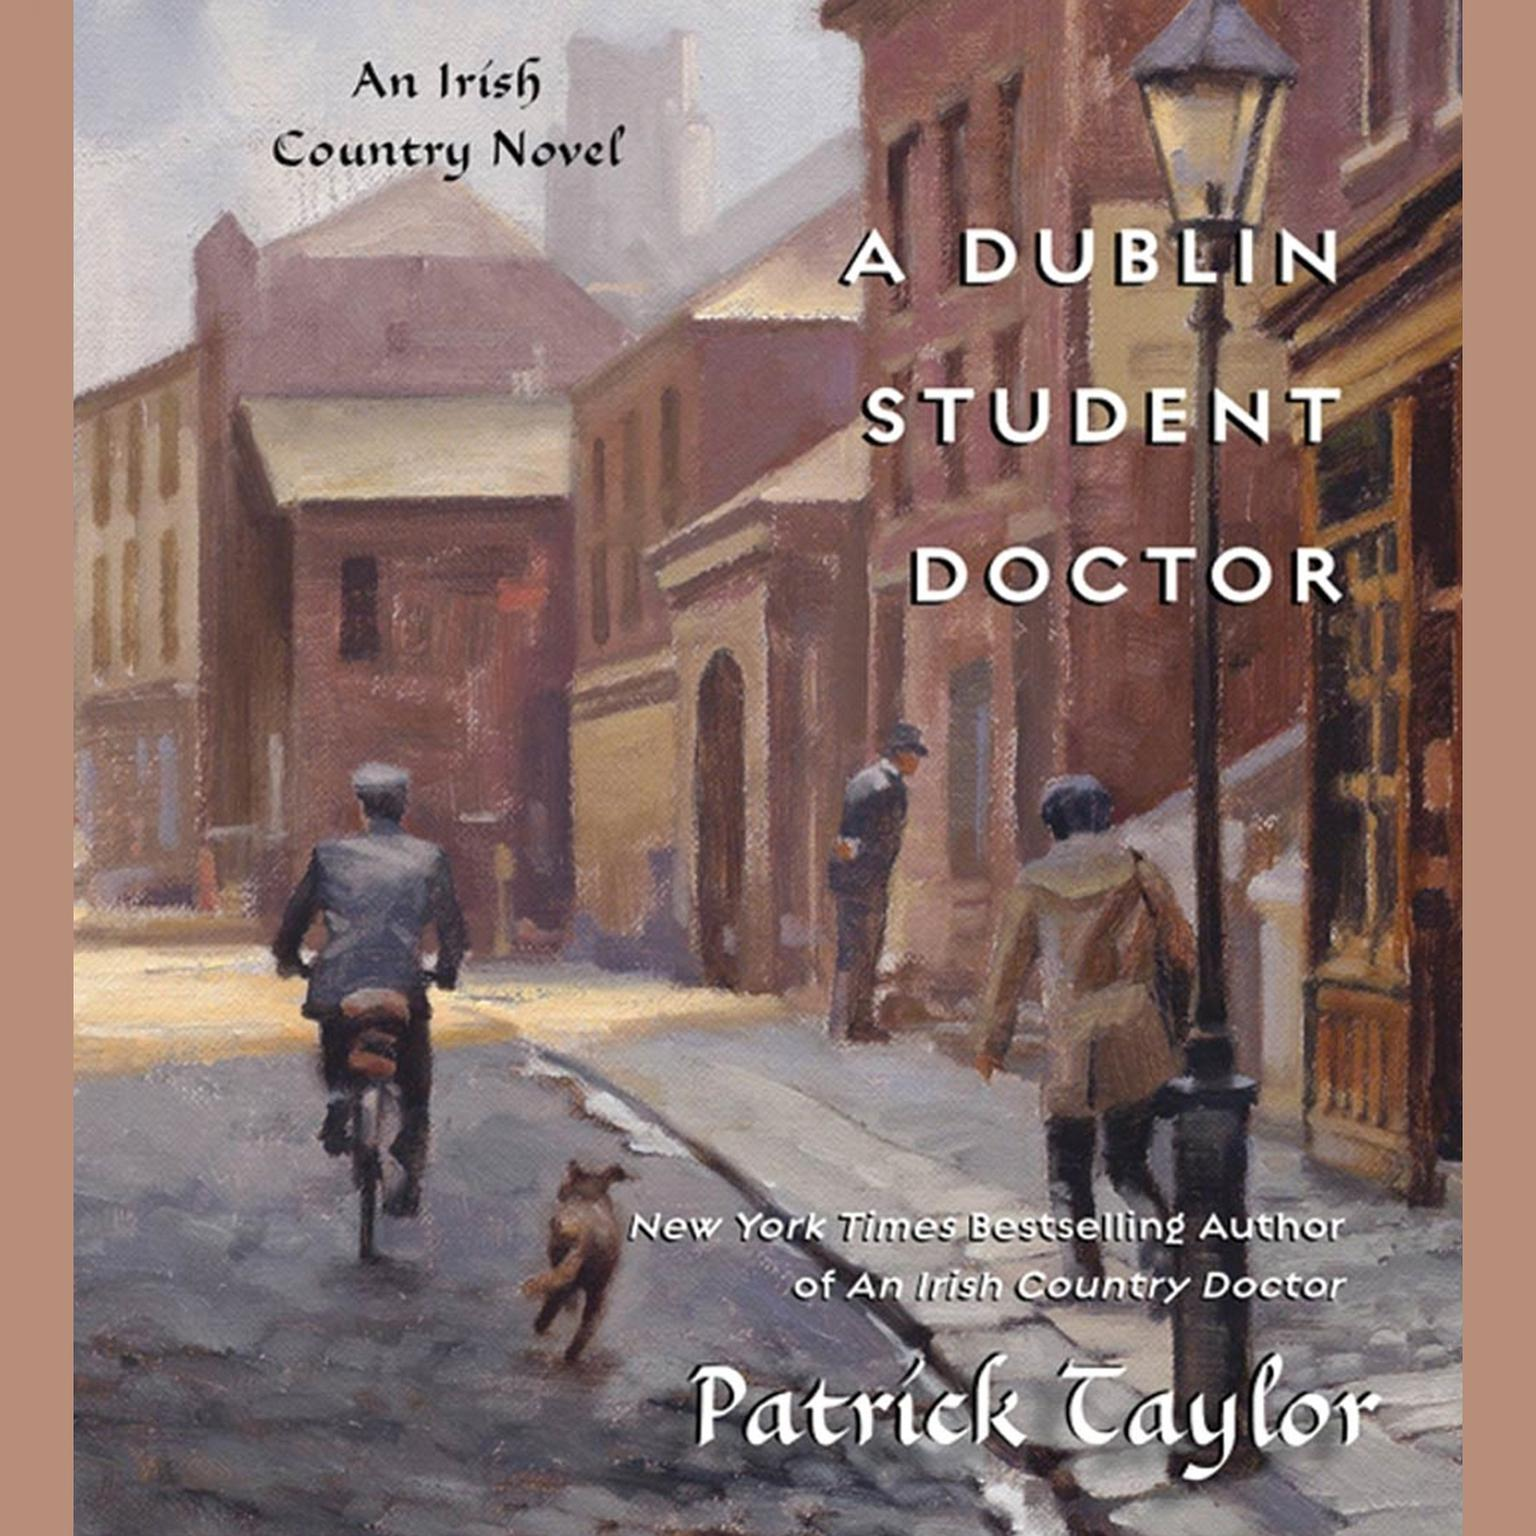 Printable A Dublin Student Doctor: An Irish Country Novel Audiobook Cover Art